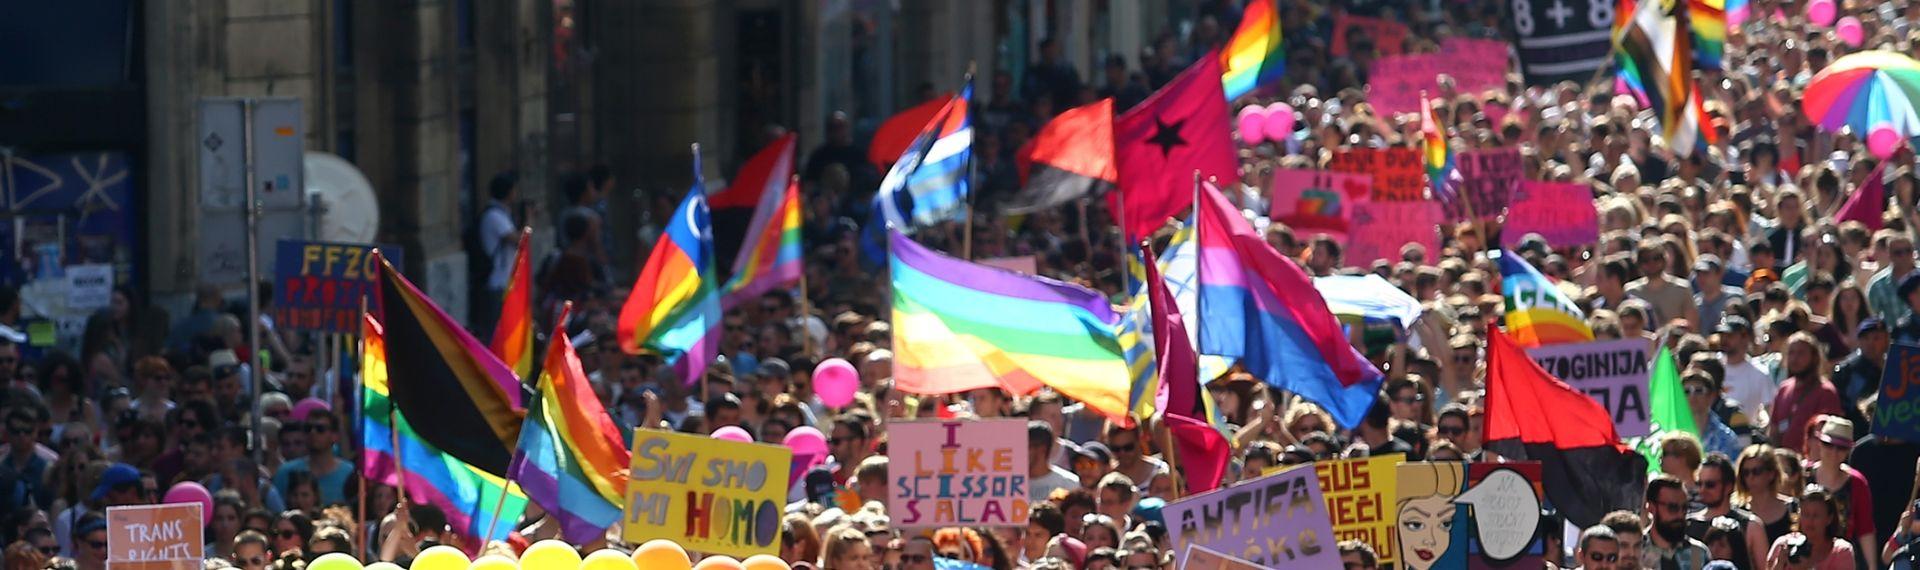 BEOGRAD: U nedjelju Parada ponosa i Trans parada